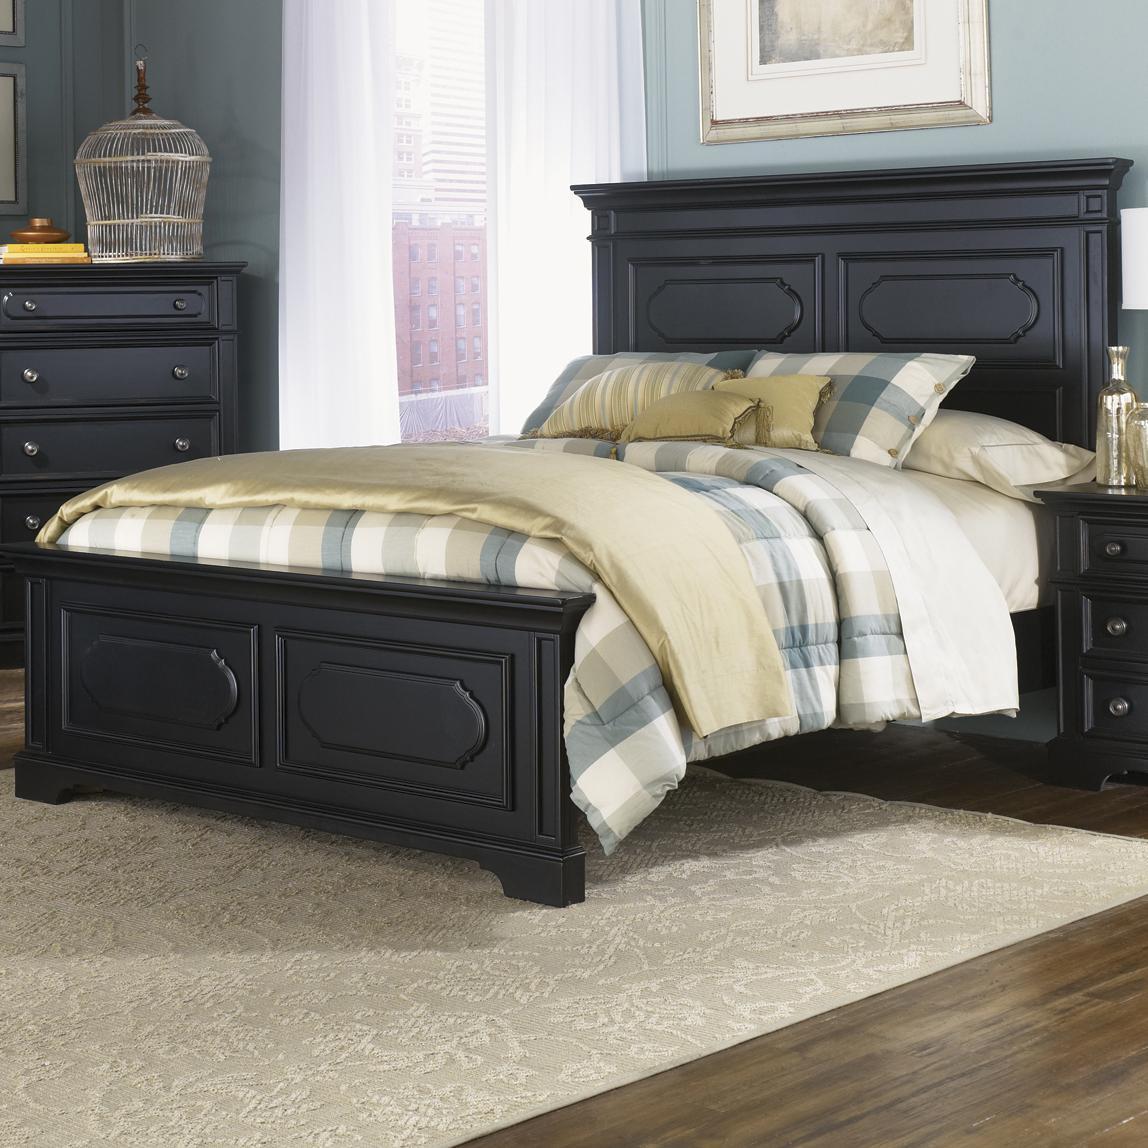 Liberty Furniture Carrington II Queen Panel Bed - Item Number: 917-BR13+14+72